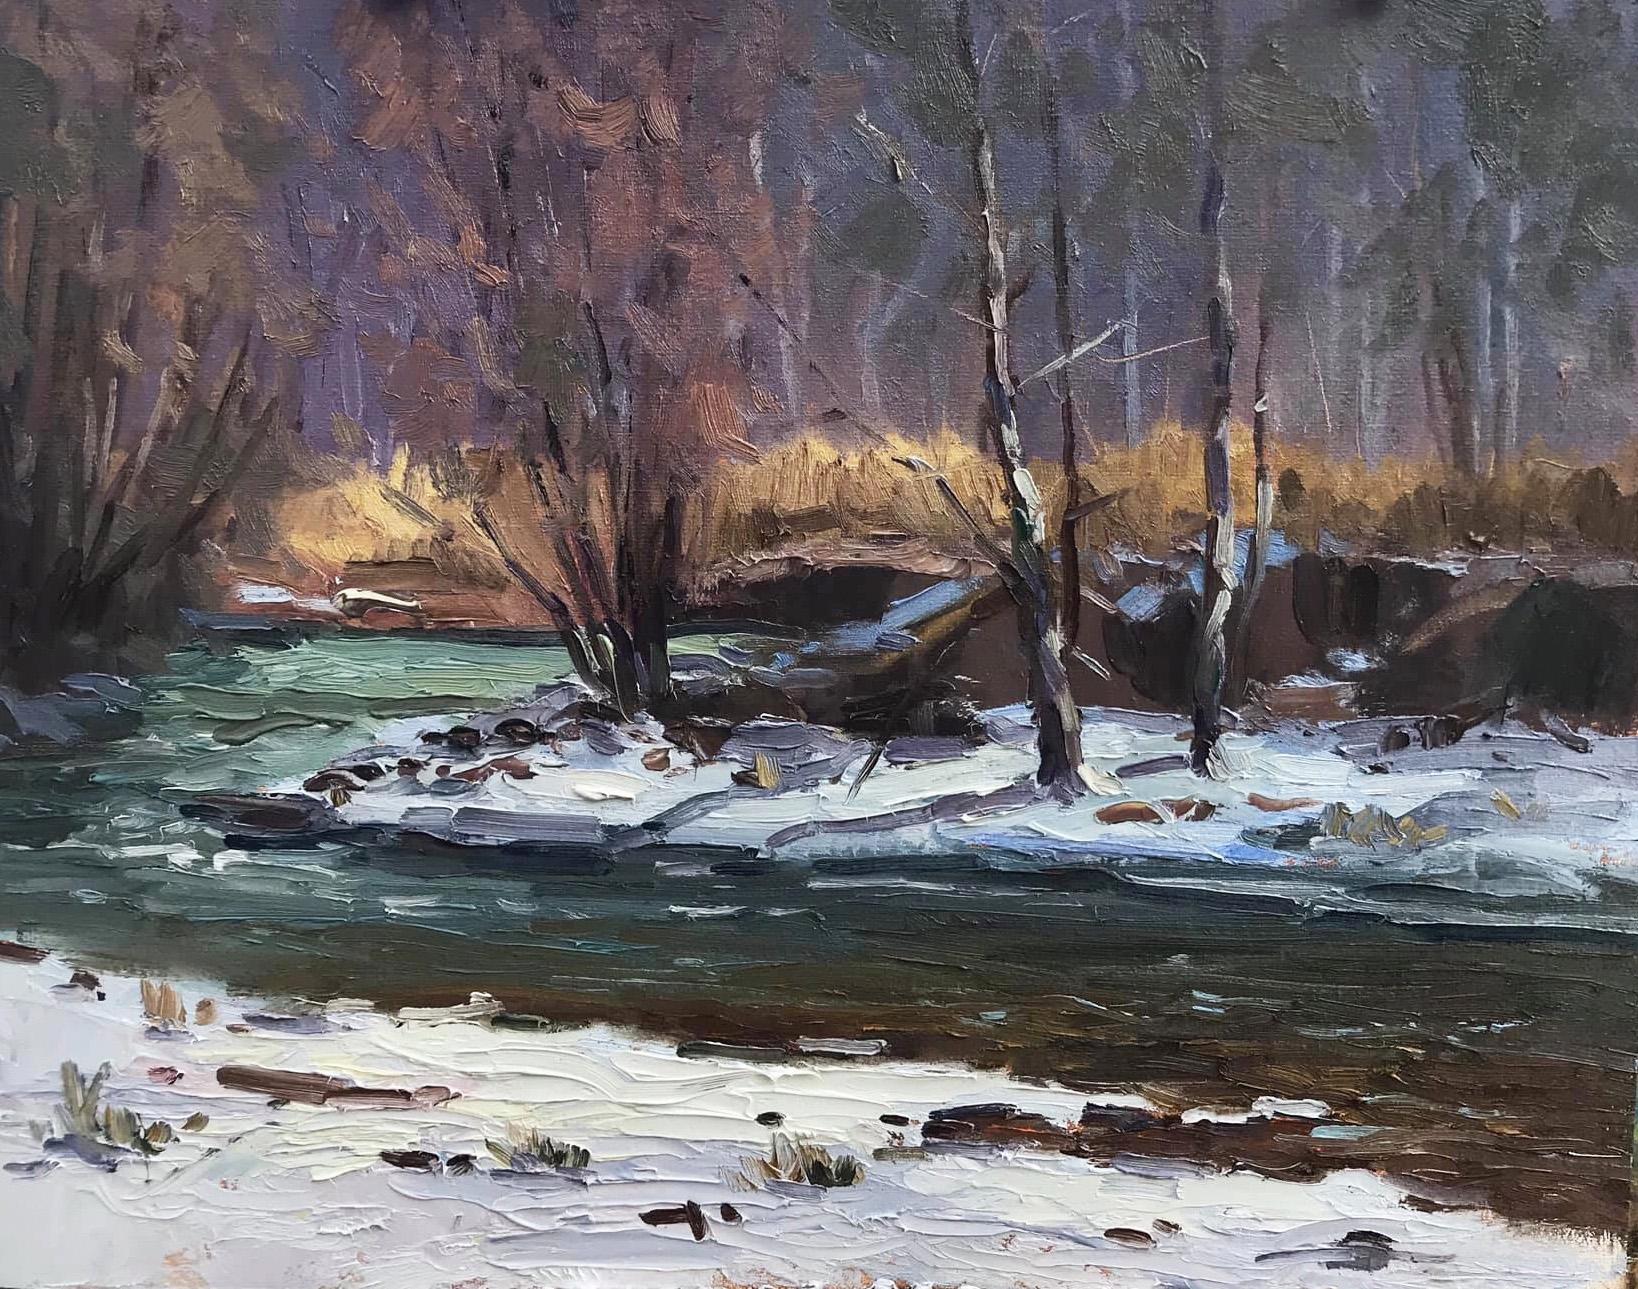 On Whychus Creek_11x14_Oil_Tillery_edited-1.jpg